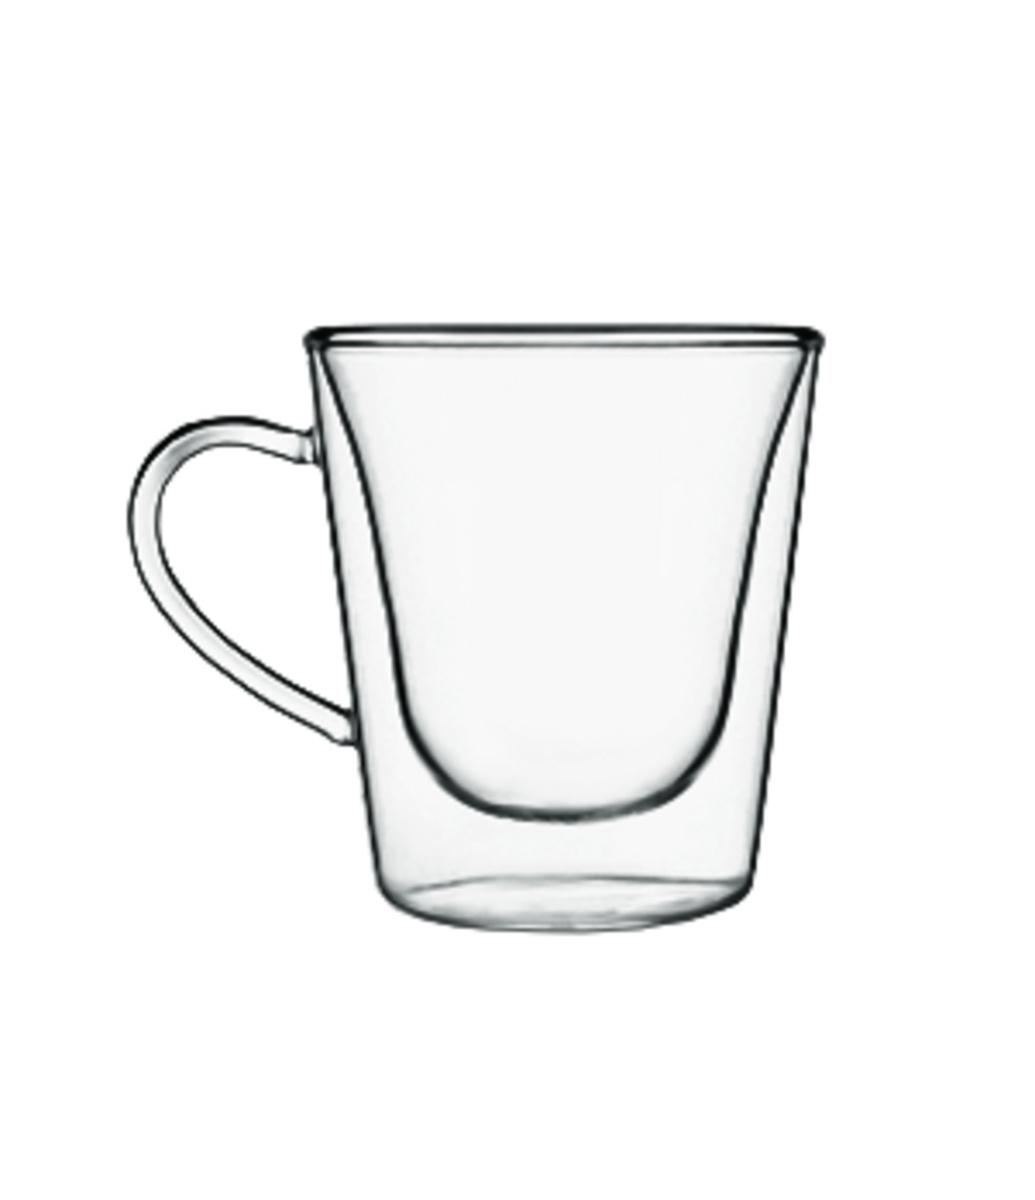 Tasse à café ronde transparente verre borosilicate 12 cl Ø 7 cm Thermic Glass Luigi Bormioli